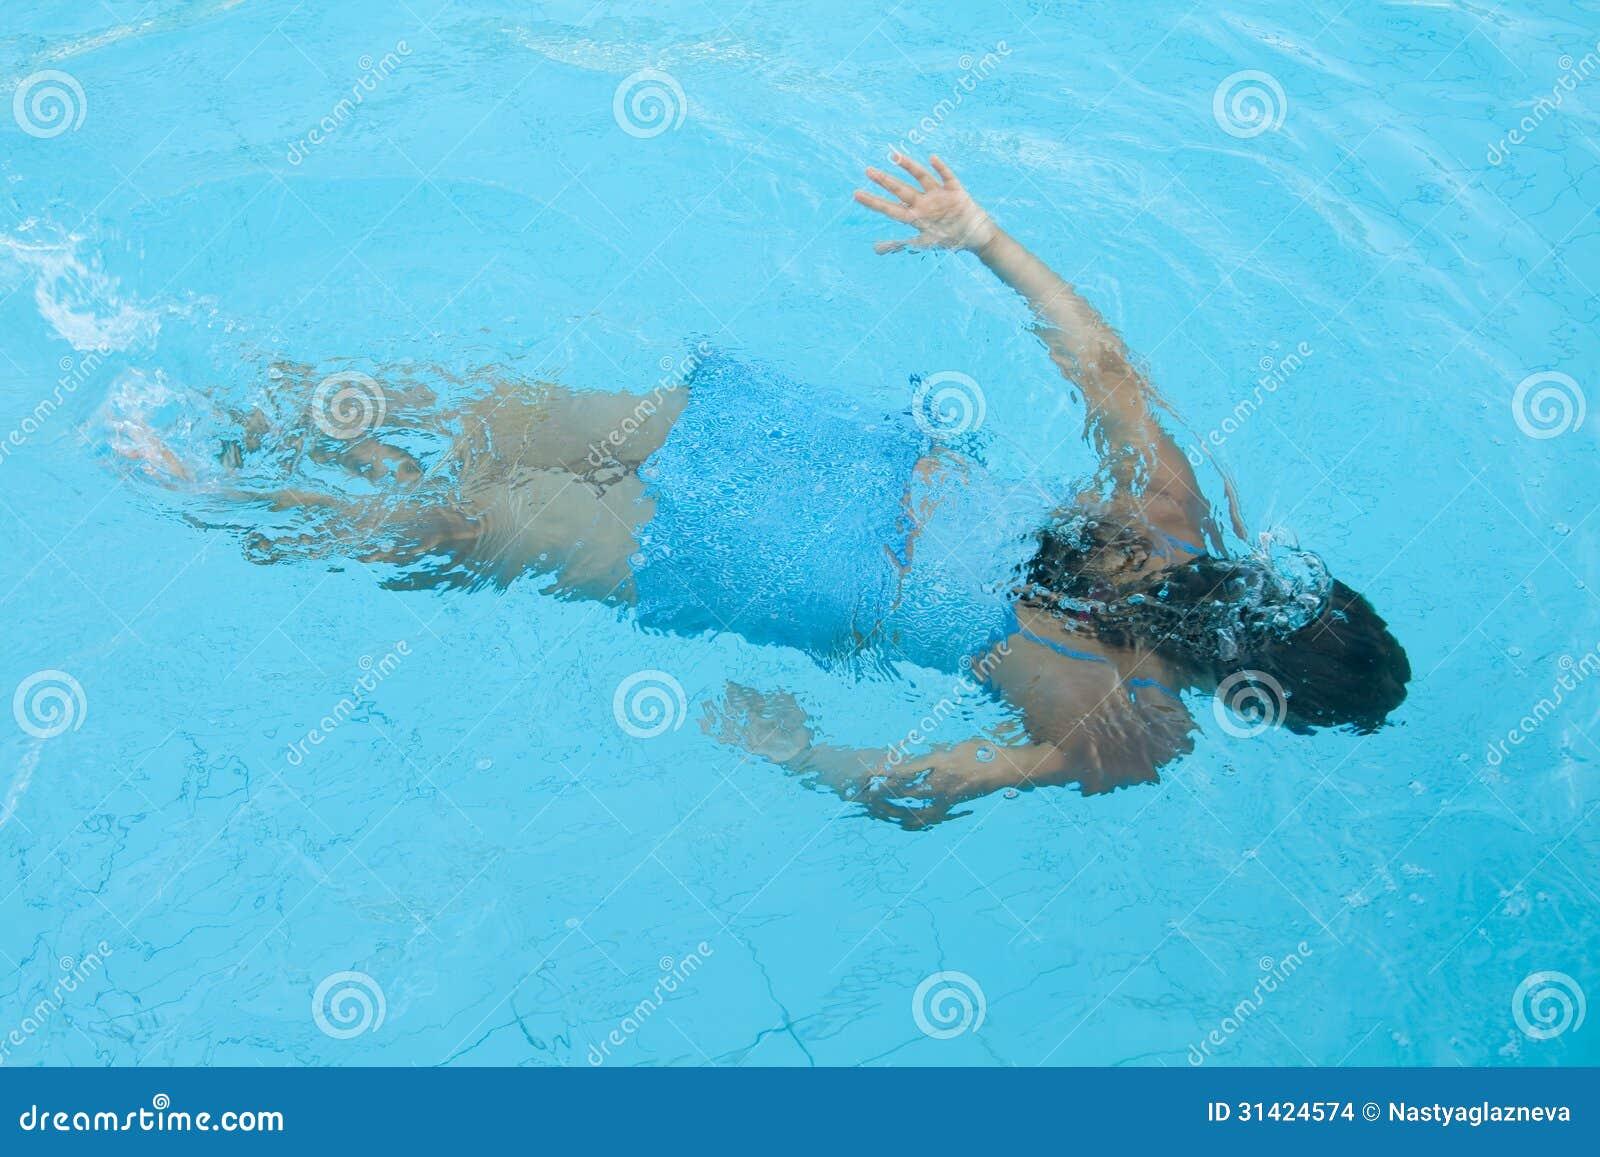 la fille nage sous l 39 eau photo stock image du fille 31424574. Black Bedroom Furniture Sets. Home Design Ideas